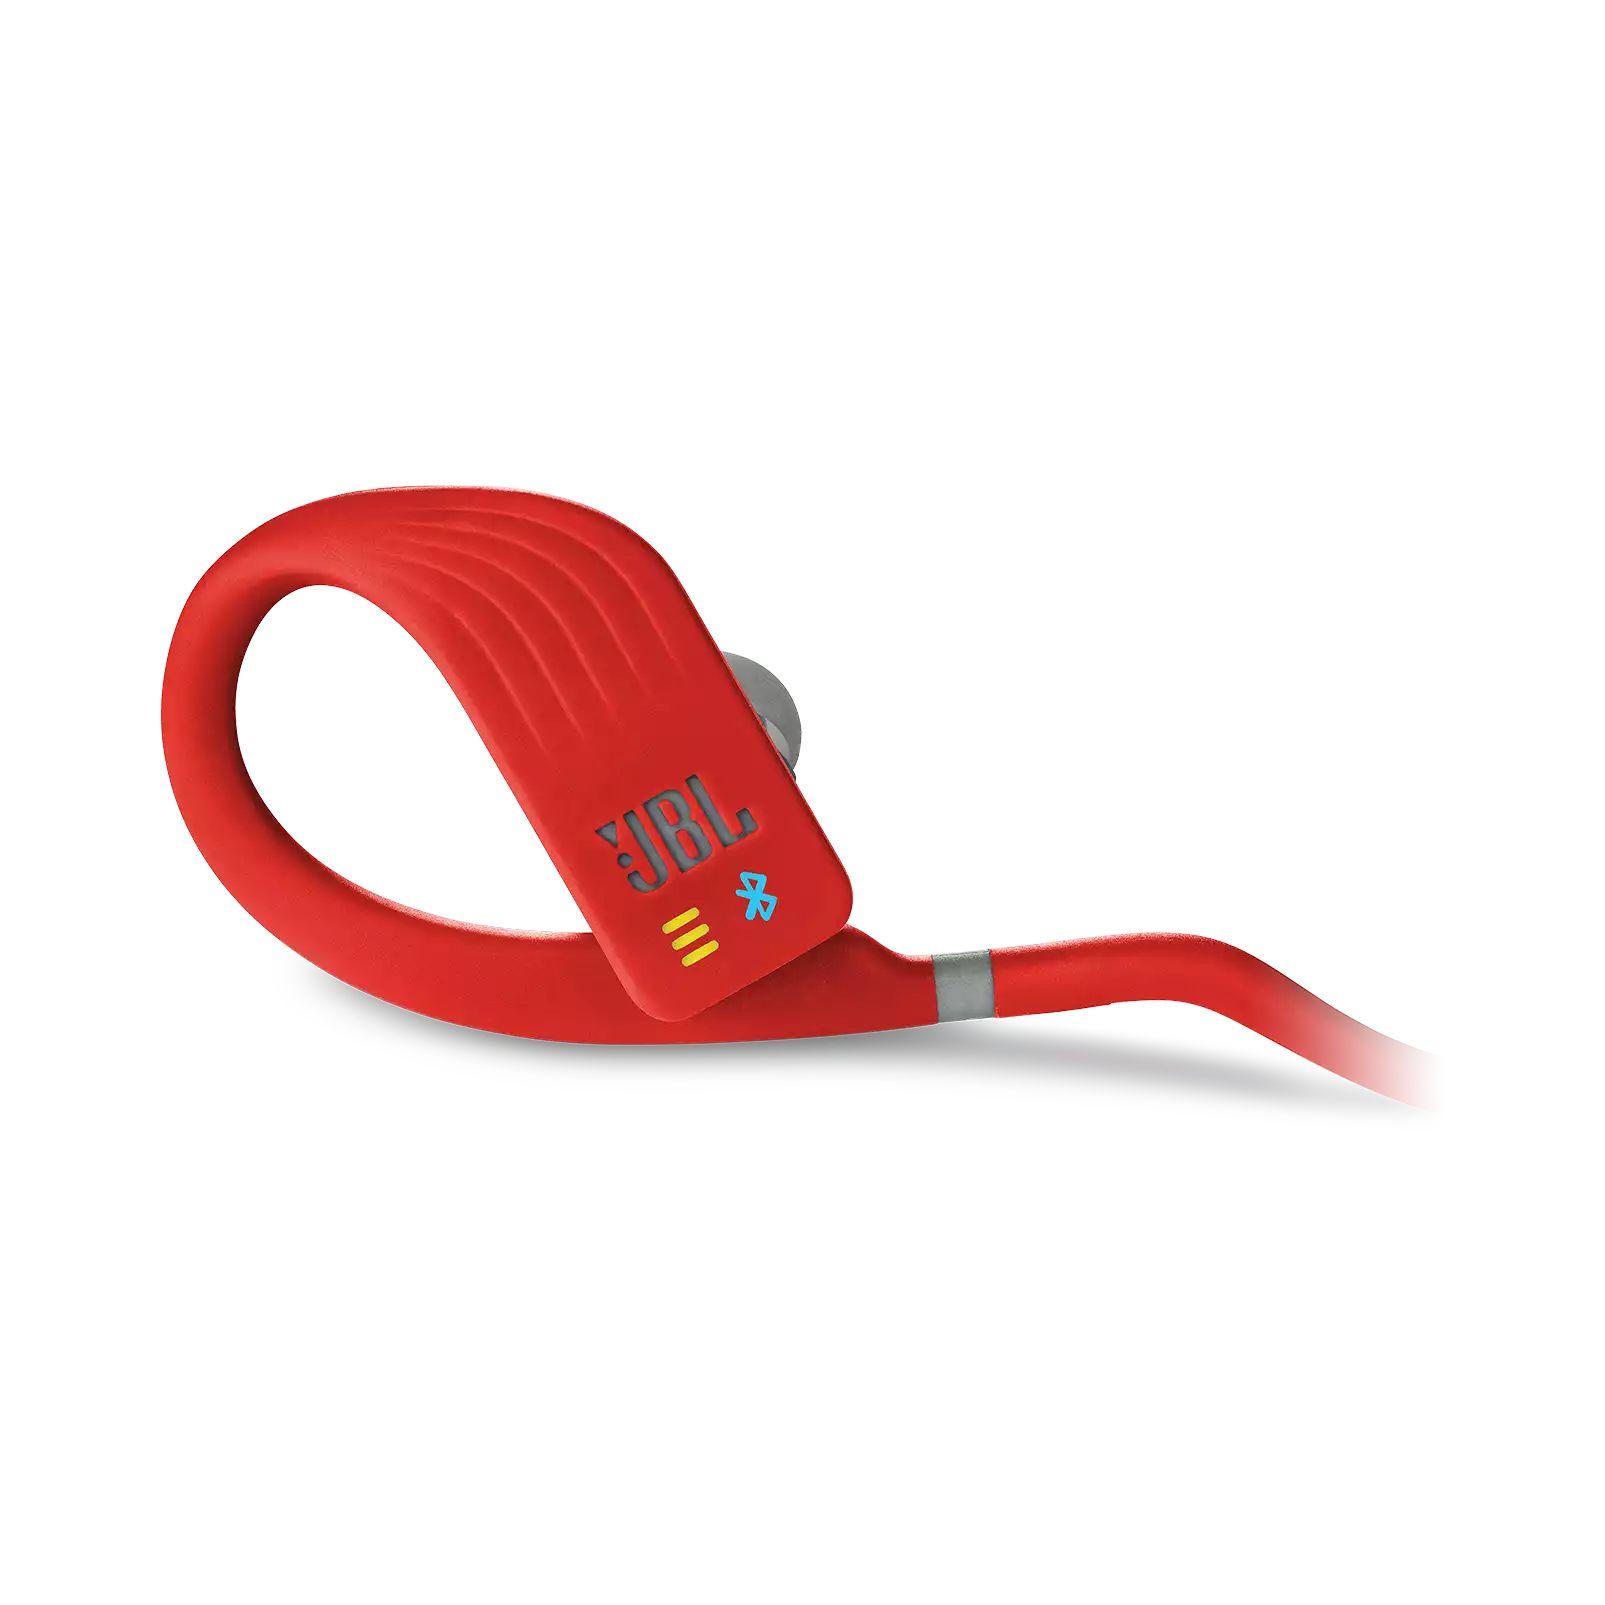 Fone de Ouvido Bluetooth JBL Endurance Dive - Vermelho e Cinza JBLENDURDIVERED